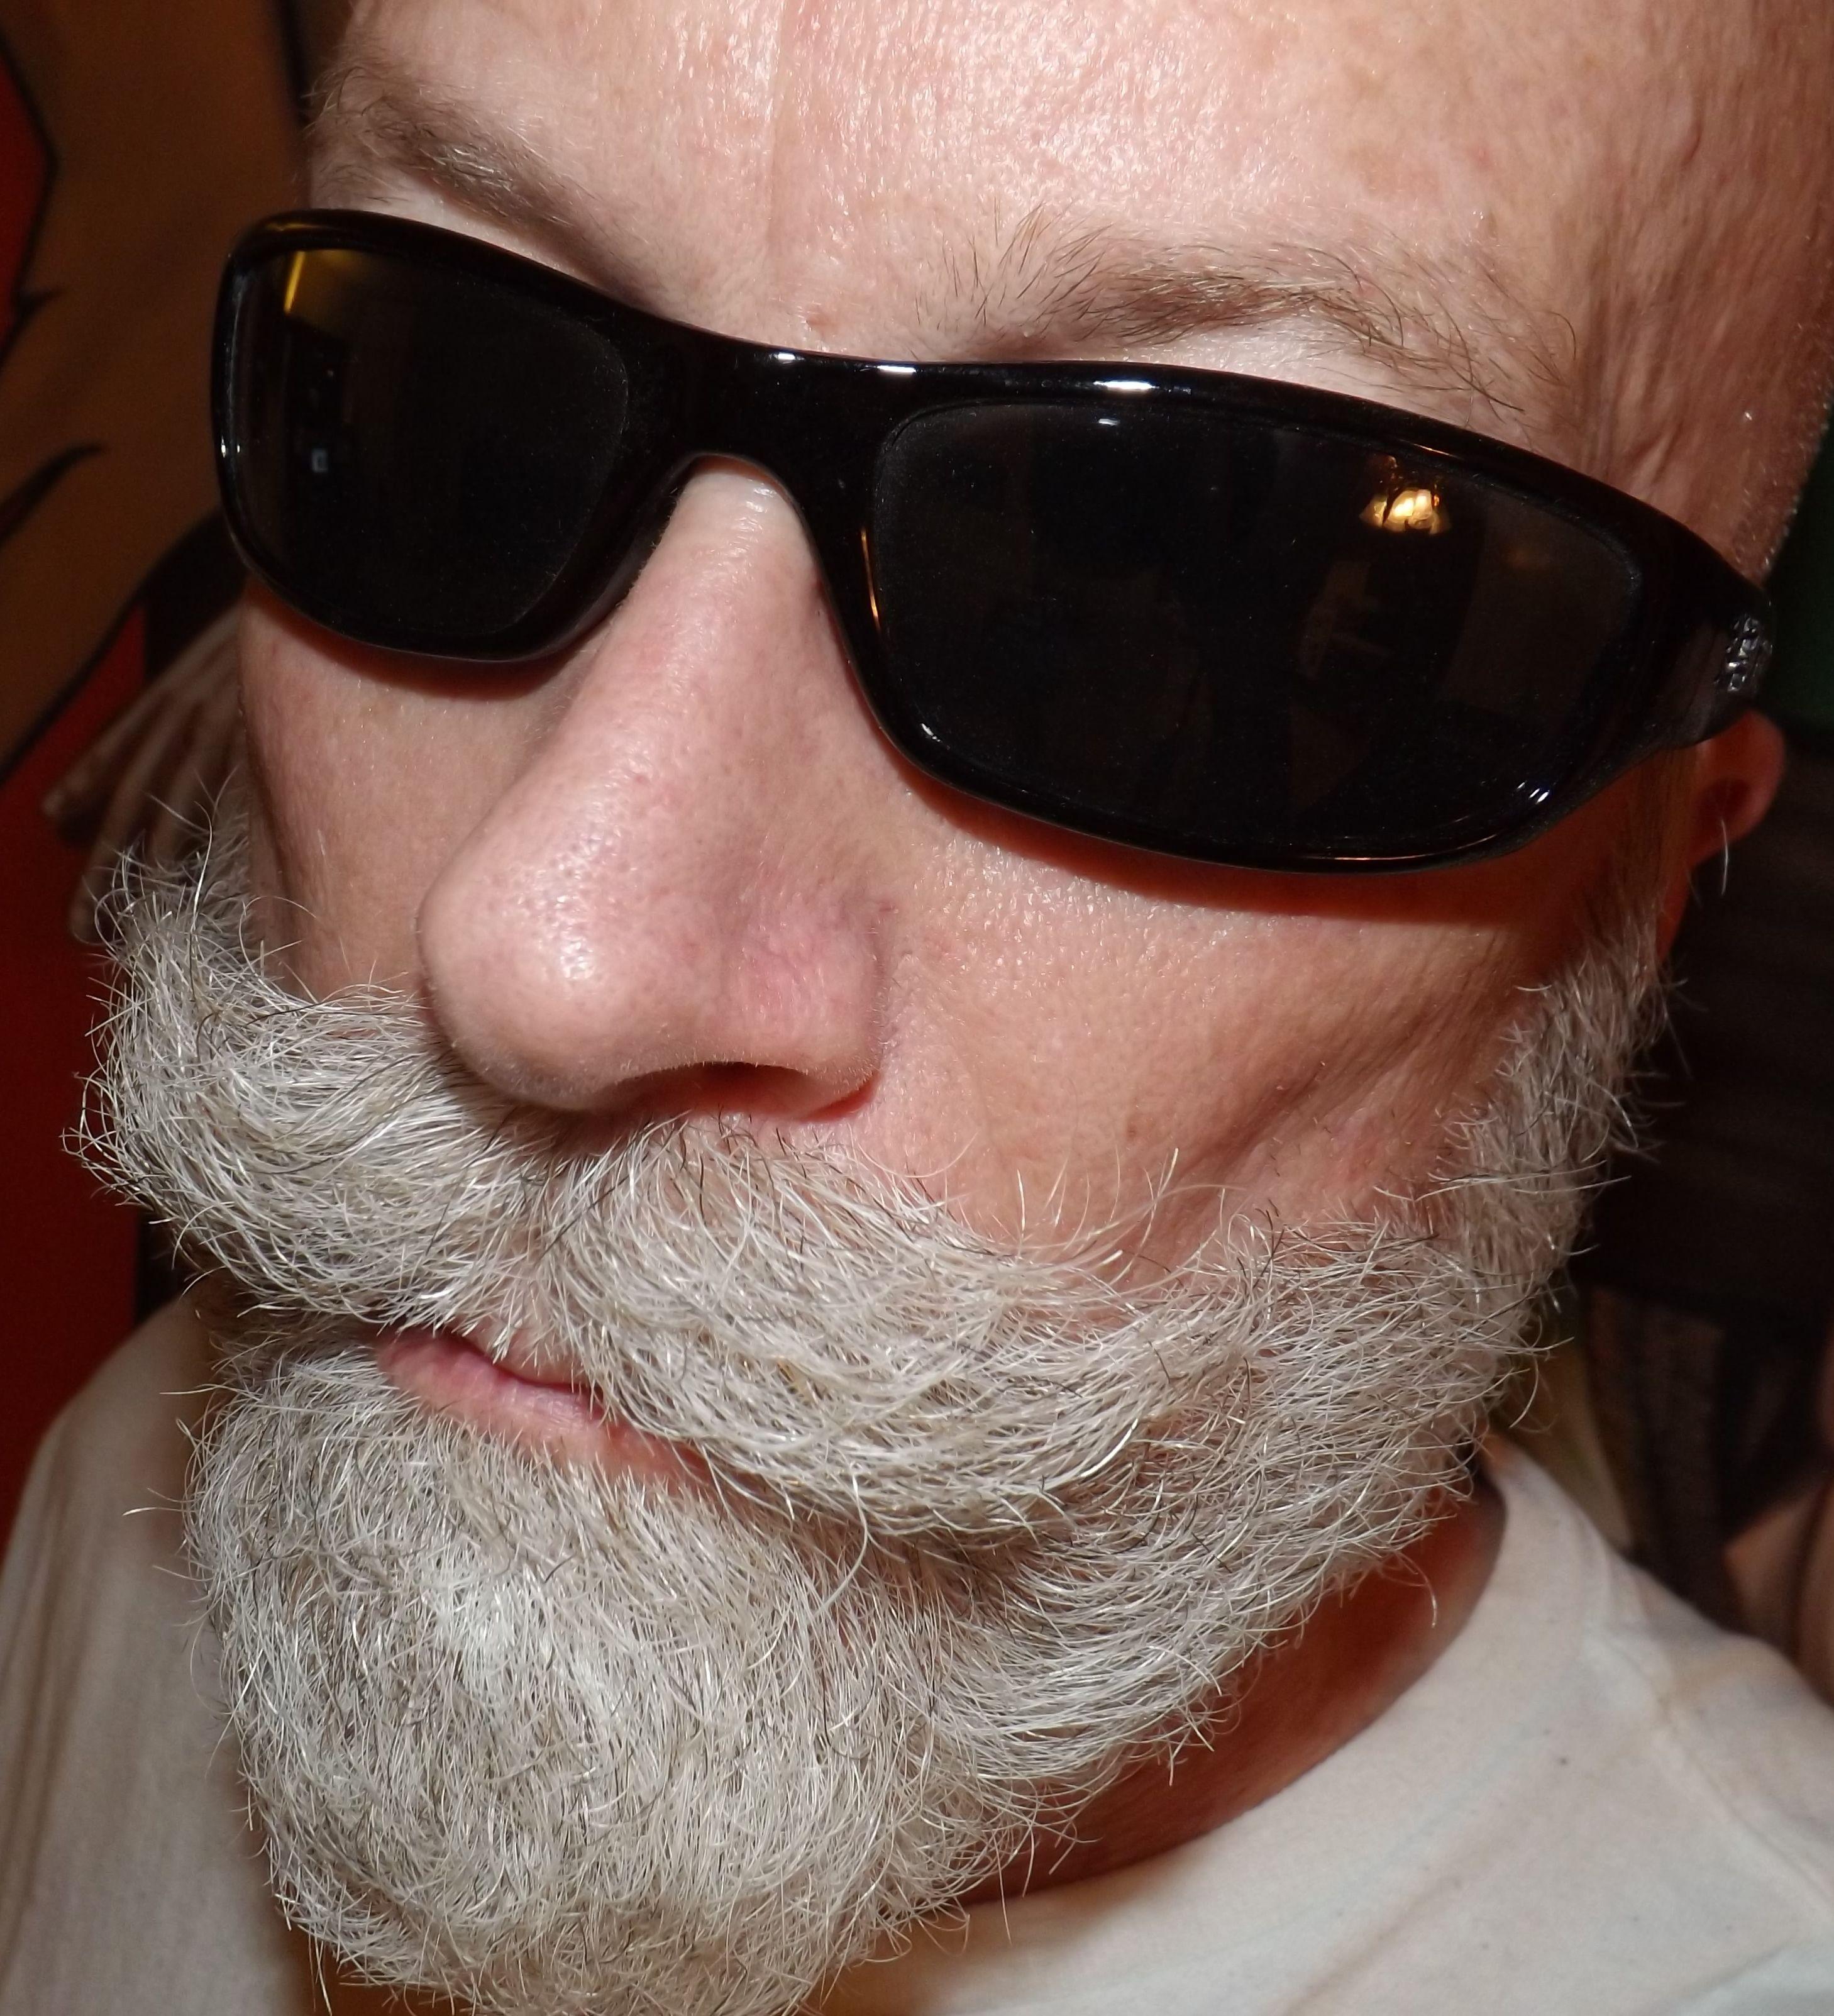 Who doesnt look good with Ray Bans??   Mens sunglasses, Beard haircut, Sunglasses